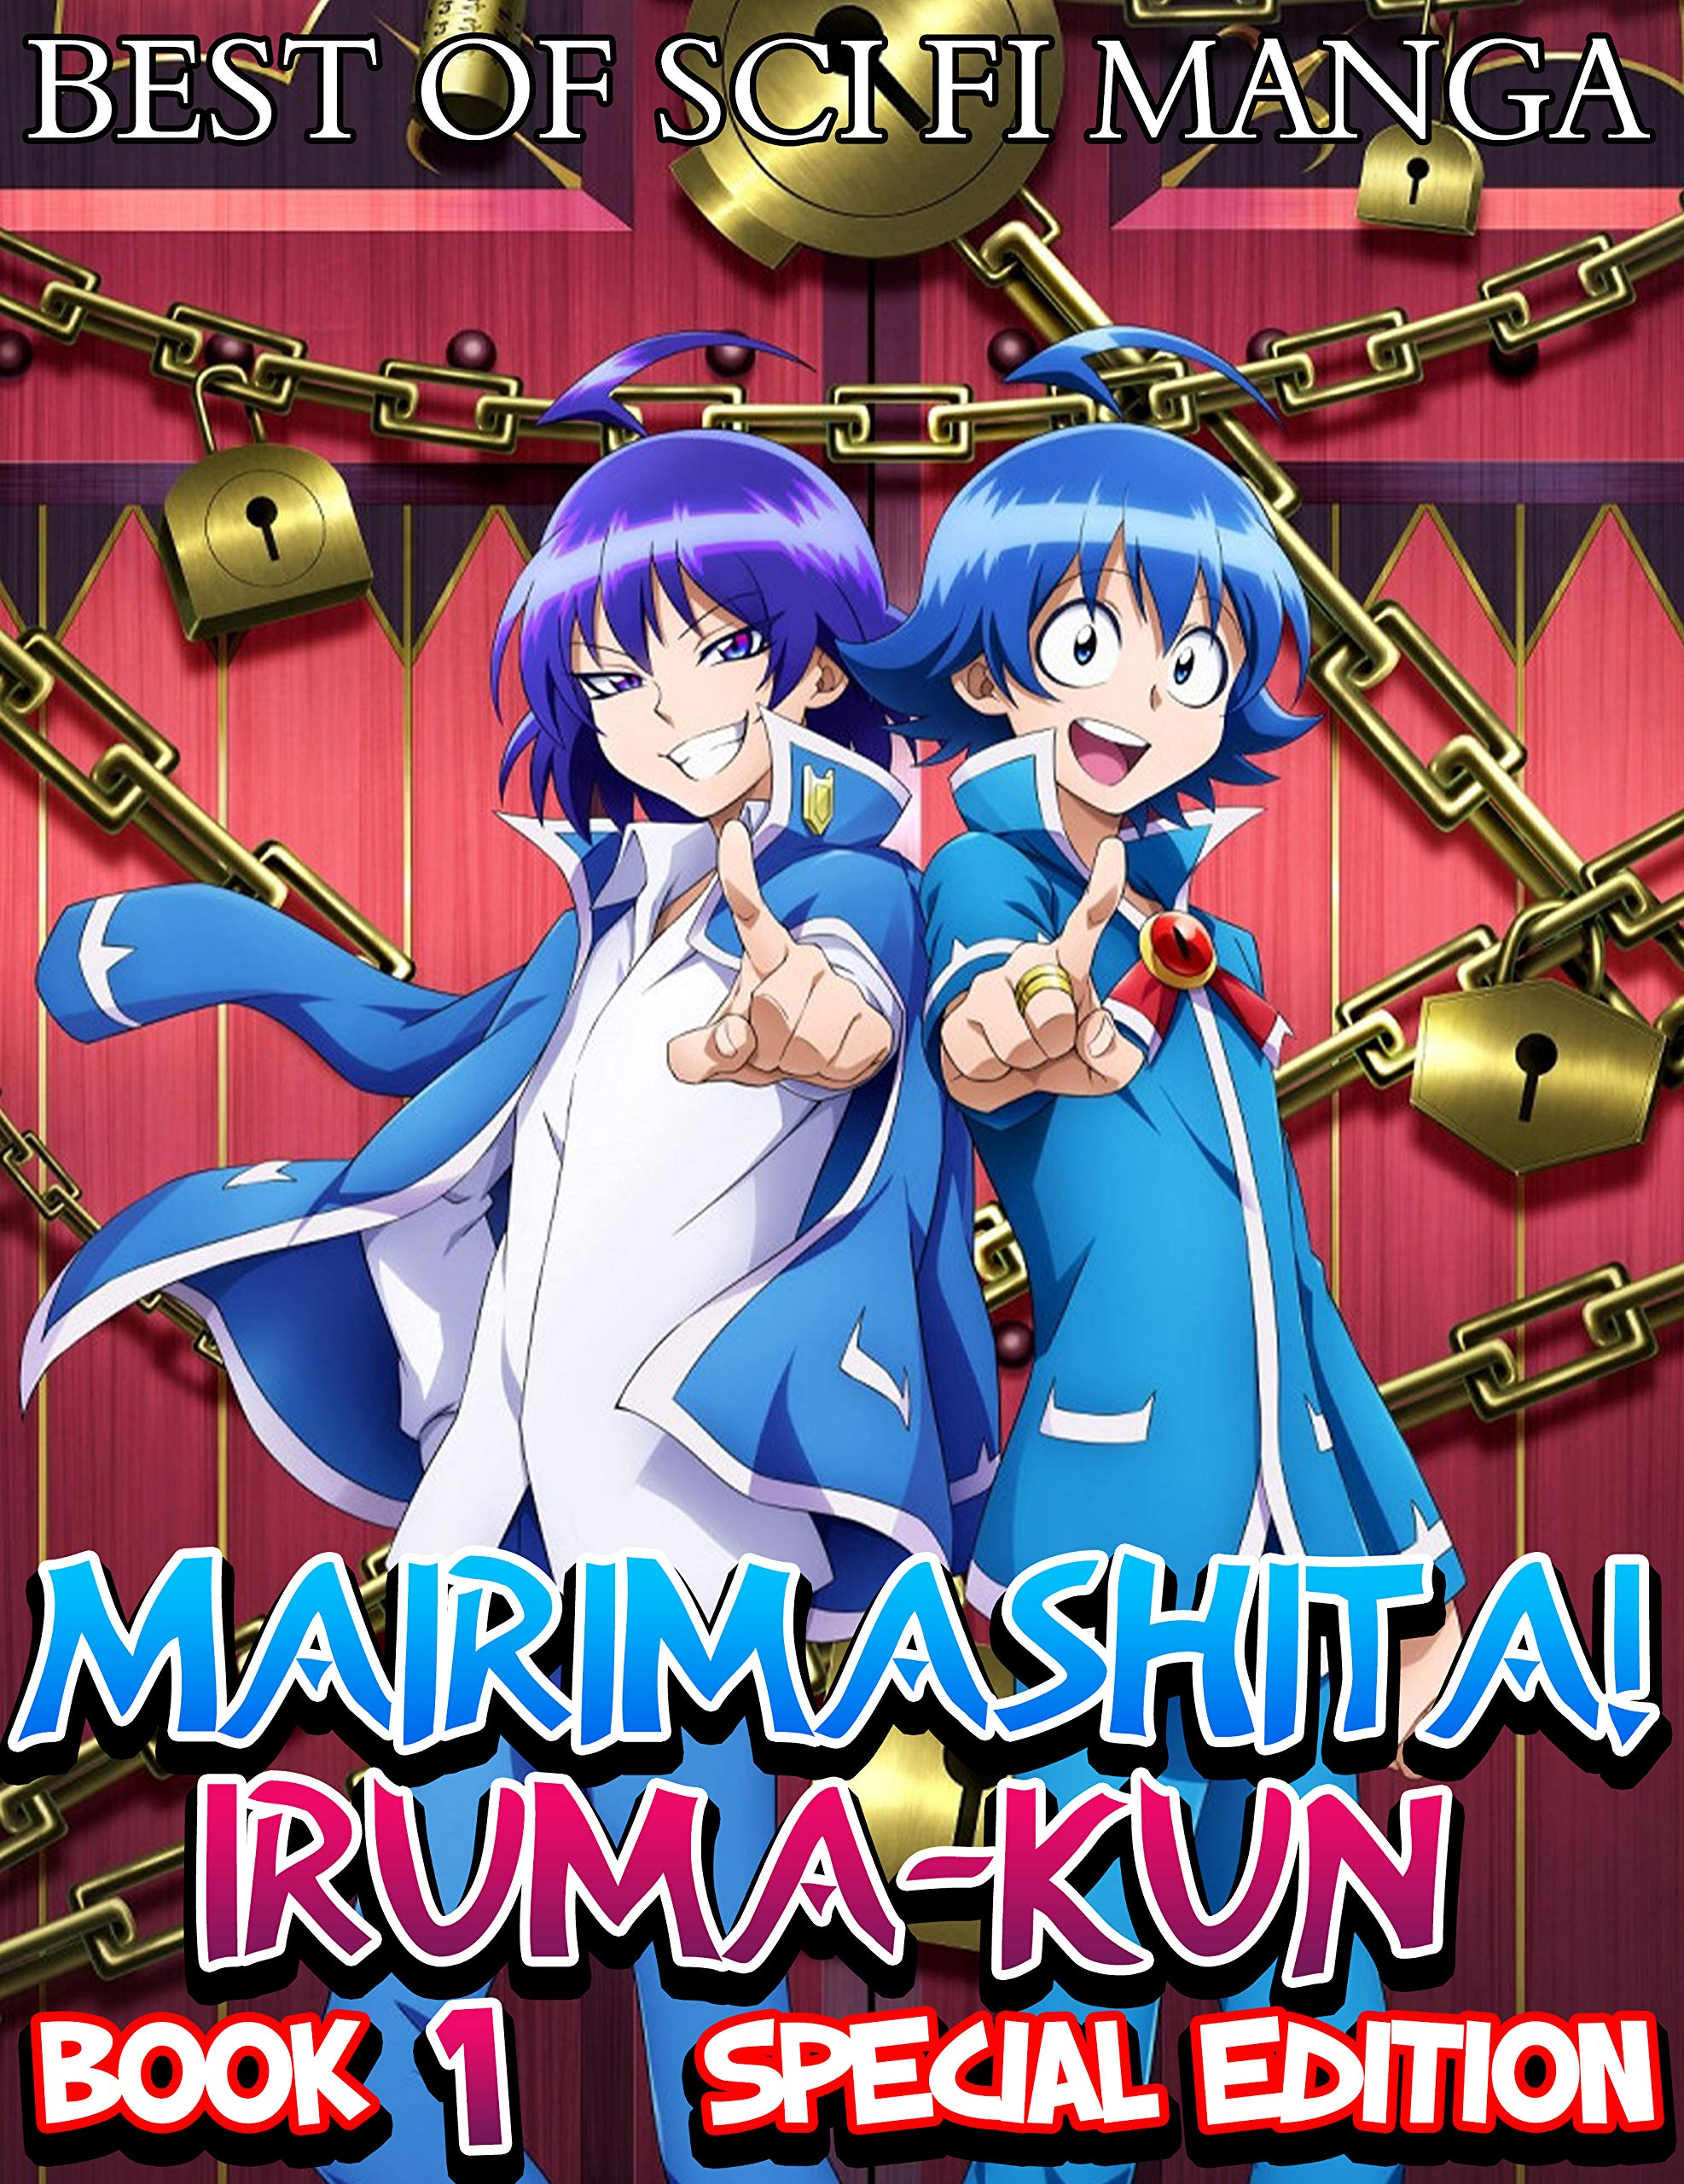 Best of Sci fi Manga Mairimashita! Iruma-Kun Special Edition: Limited Edition Mairimashita! Iruma-Kun Book 1